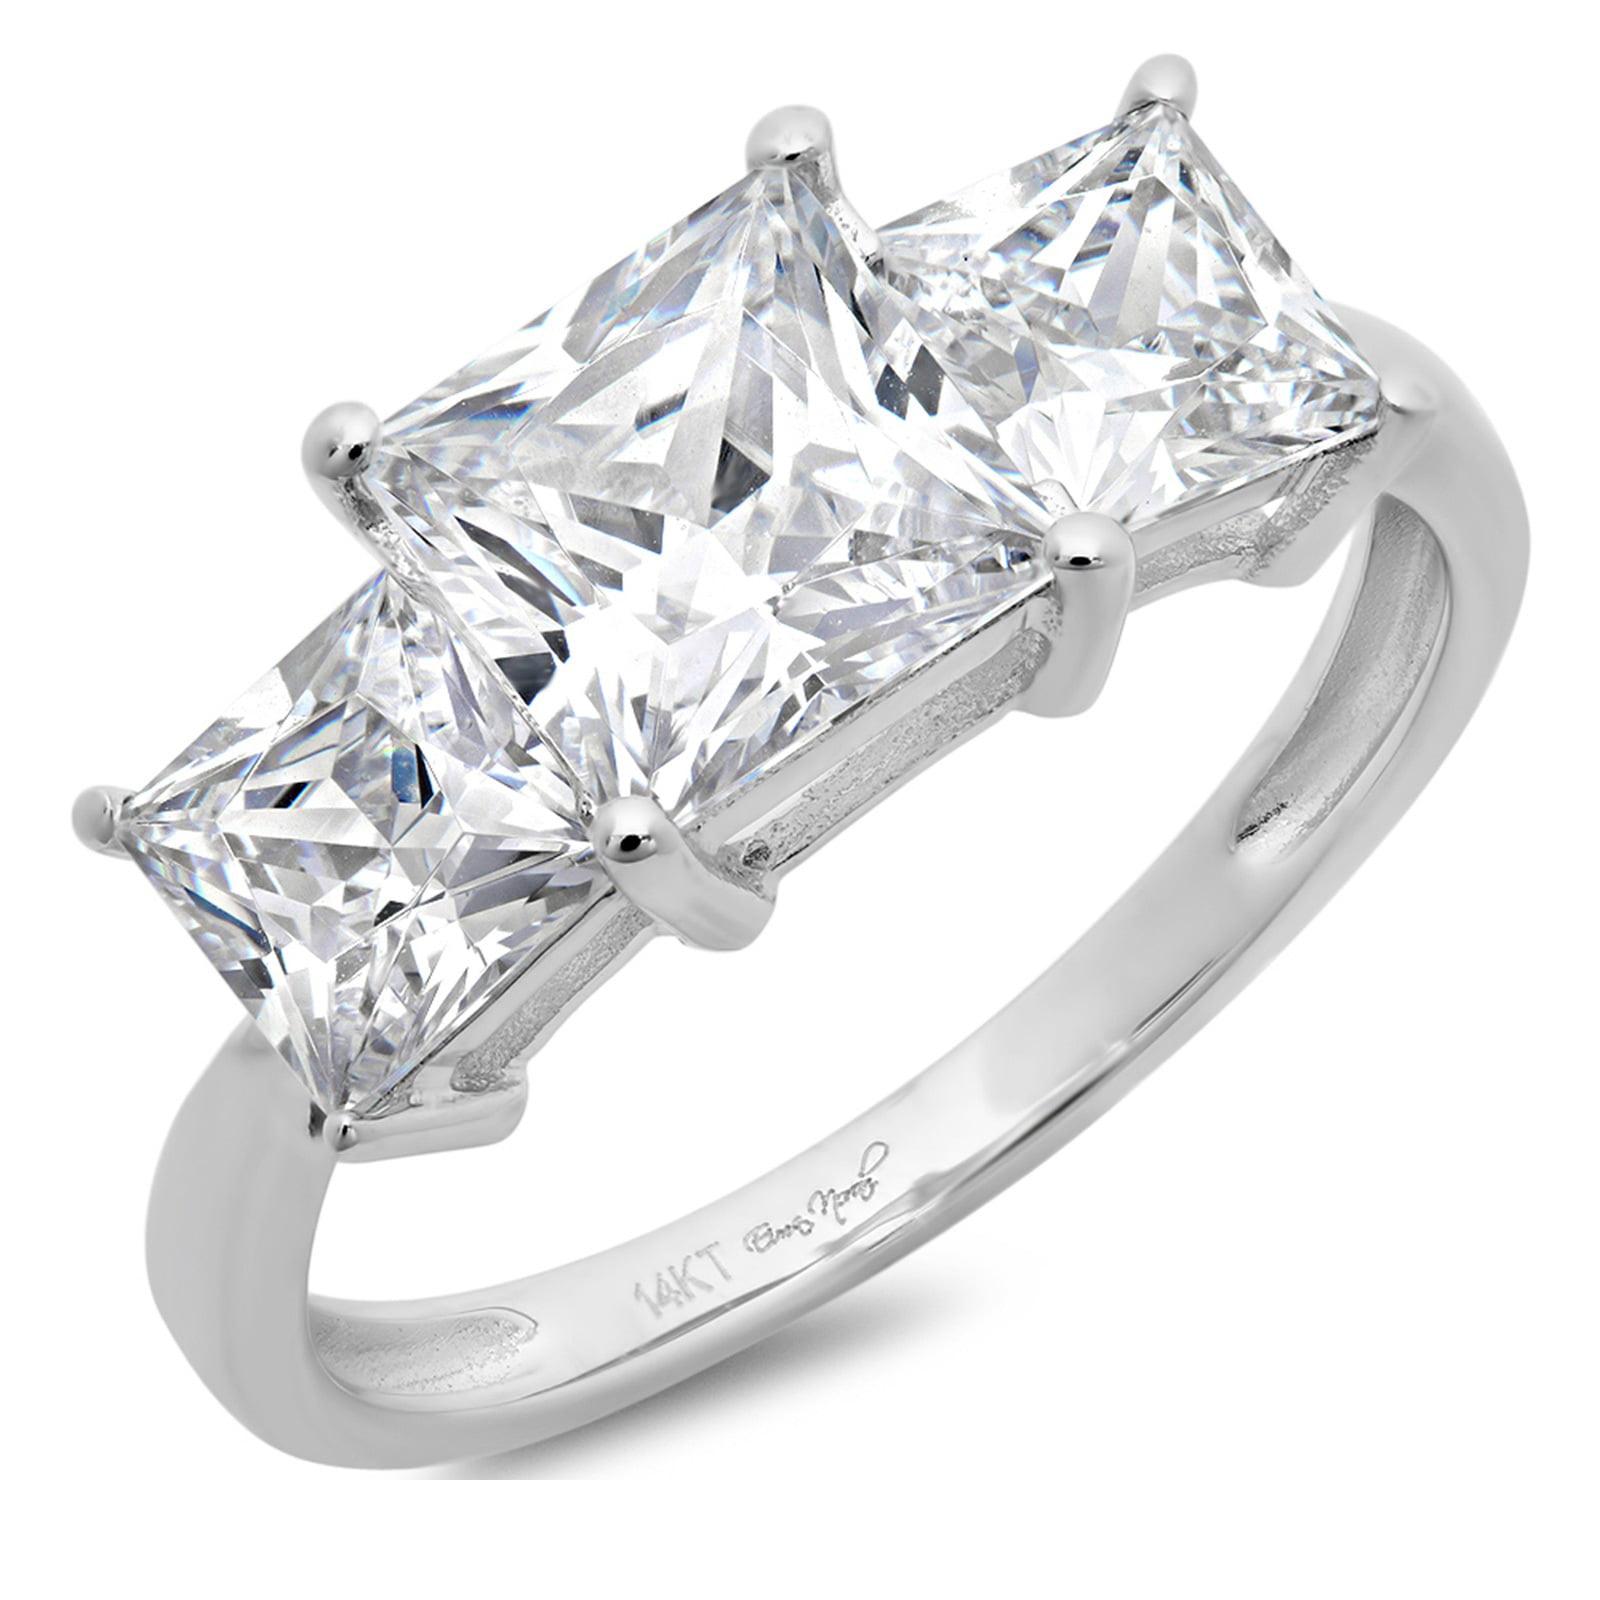 3.0 CT Three Stone Princess Cut Sim Diamond CZ Solitaire ...